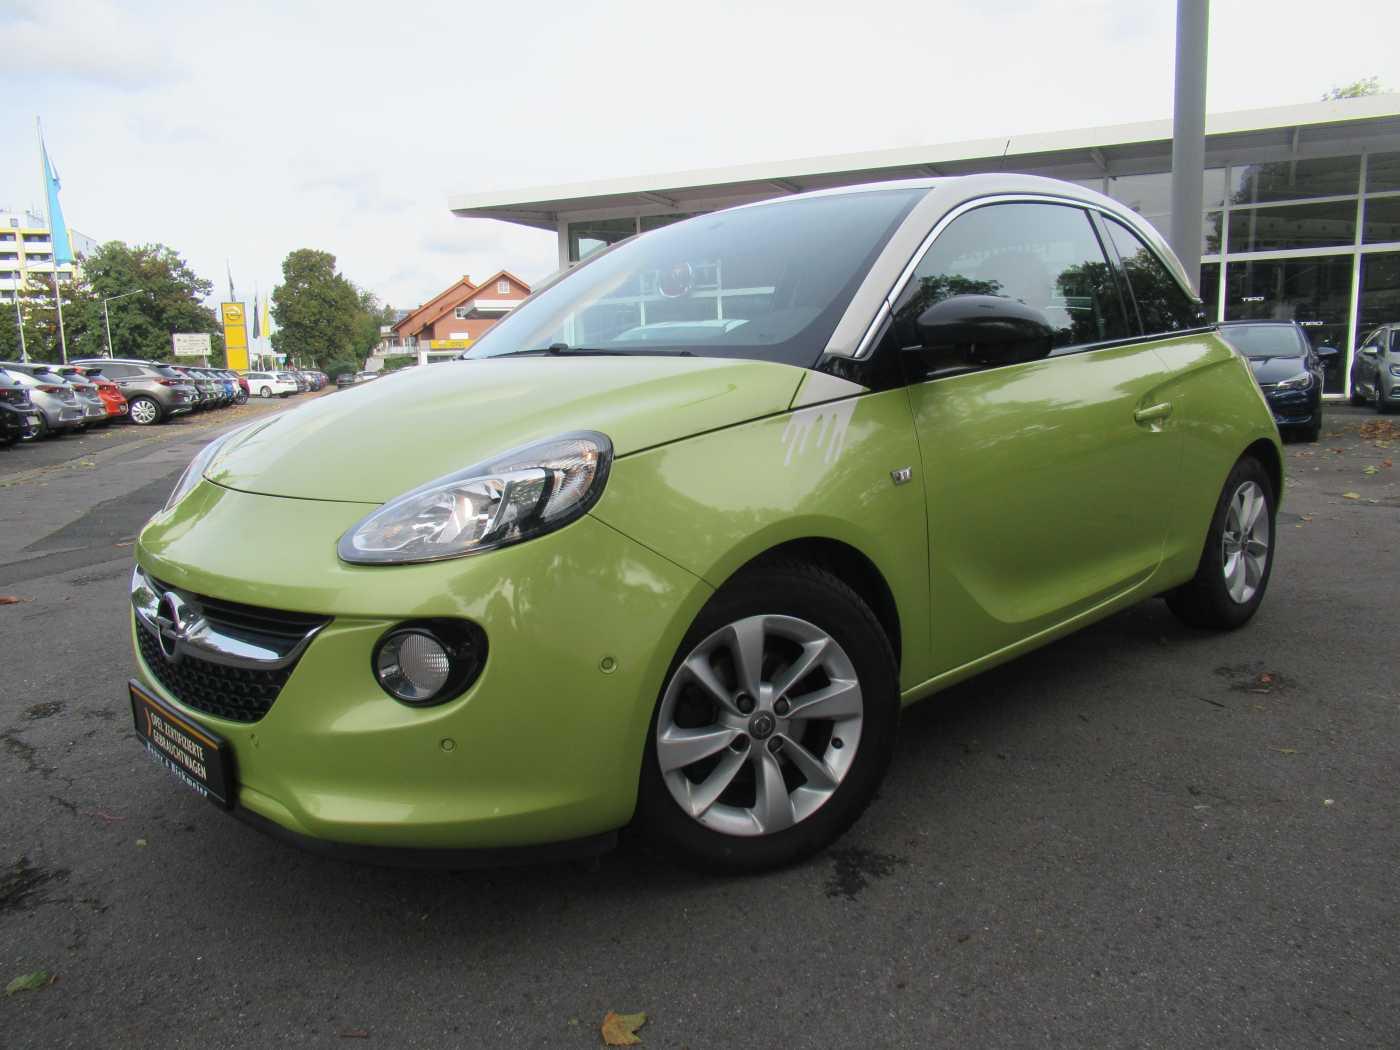 Opel Adam 1.4 Jam INTELLILINK+PARKASSISTENT+MULTICOLOR LED, Jahr 2014, Benzin